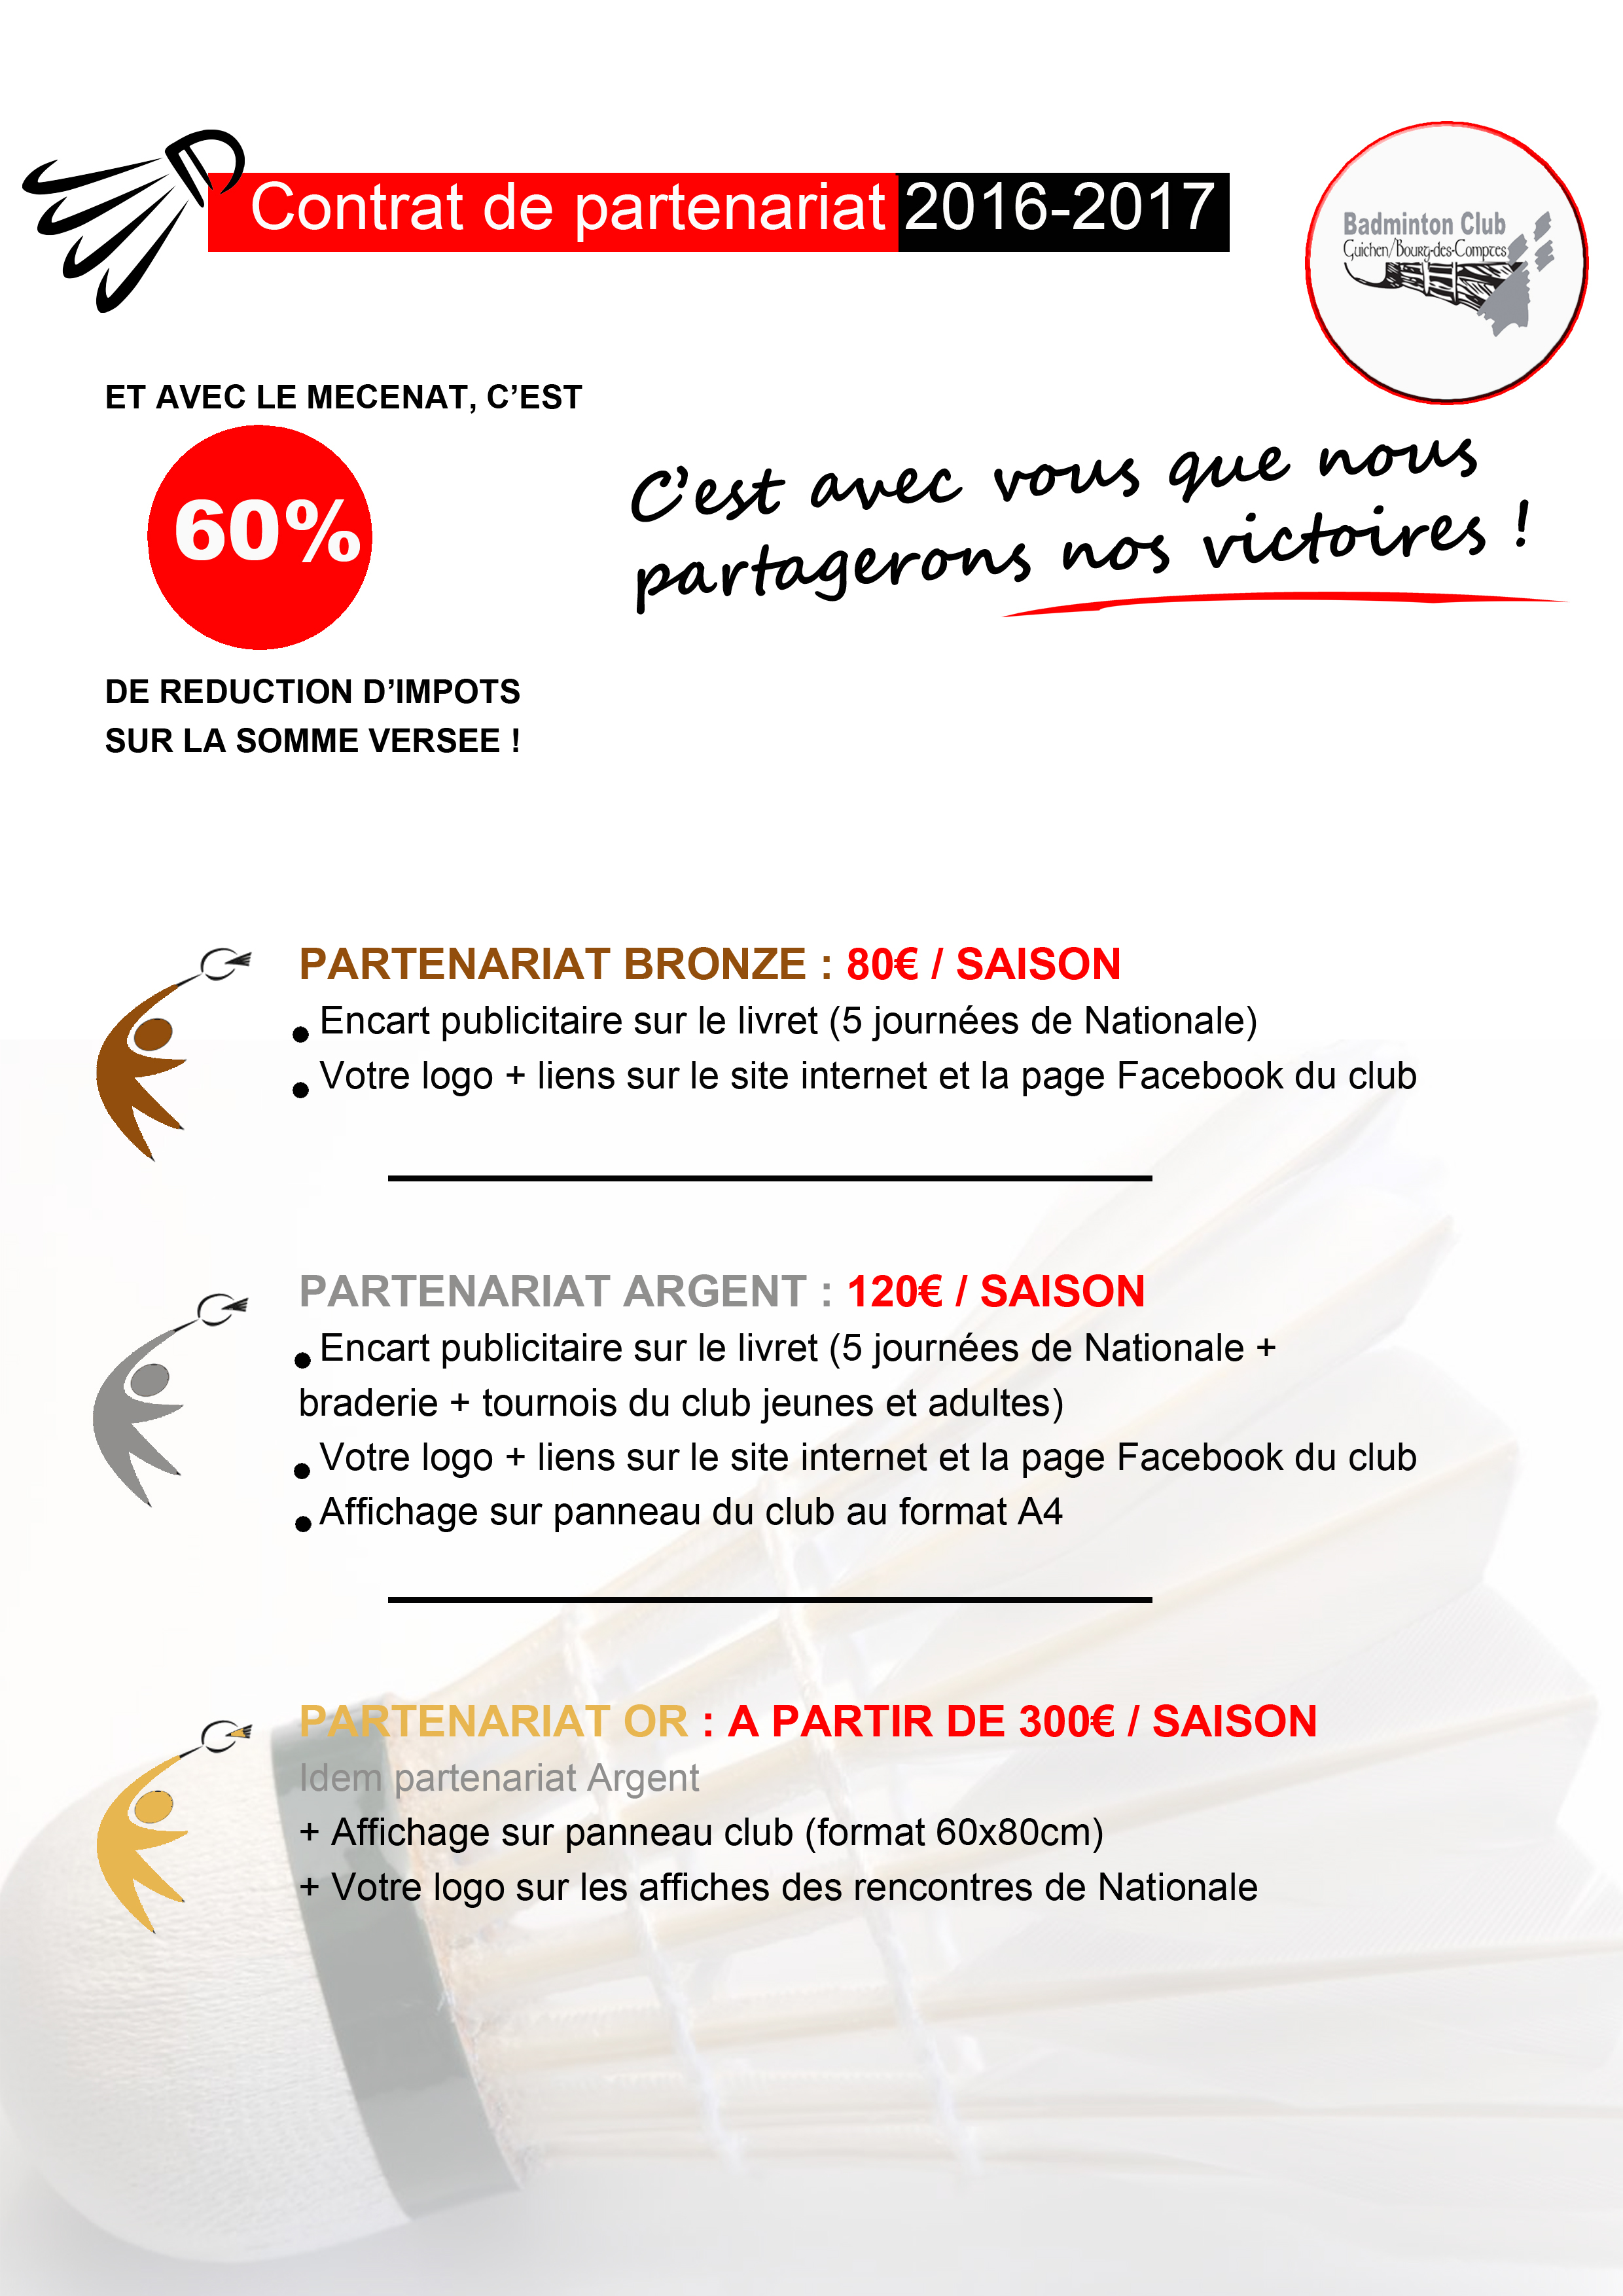 fiche-tarifaire-1-2016-2017